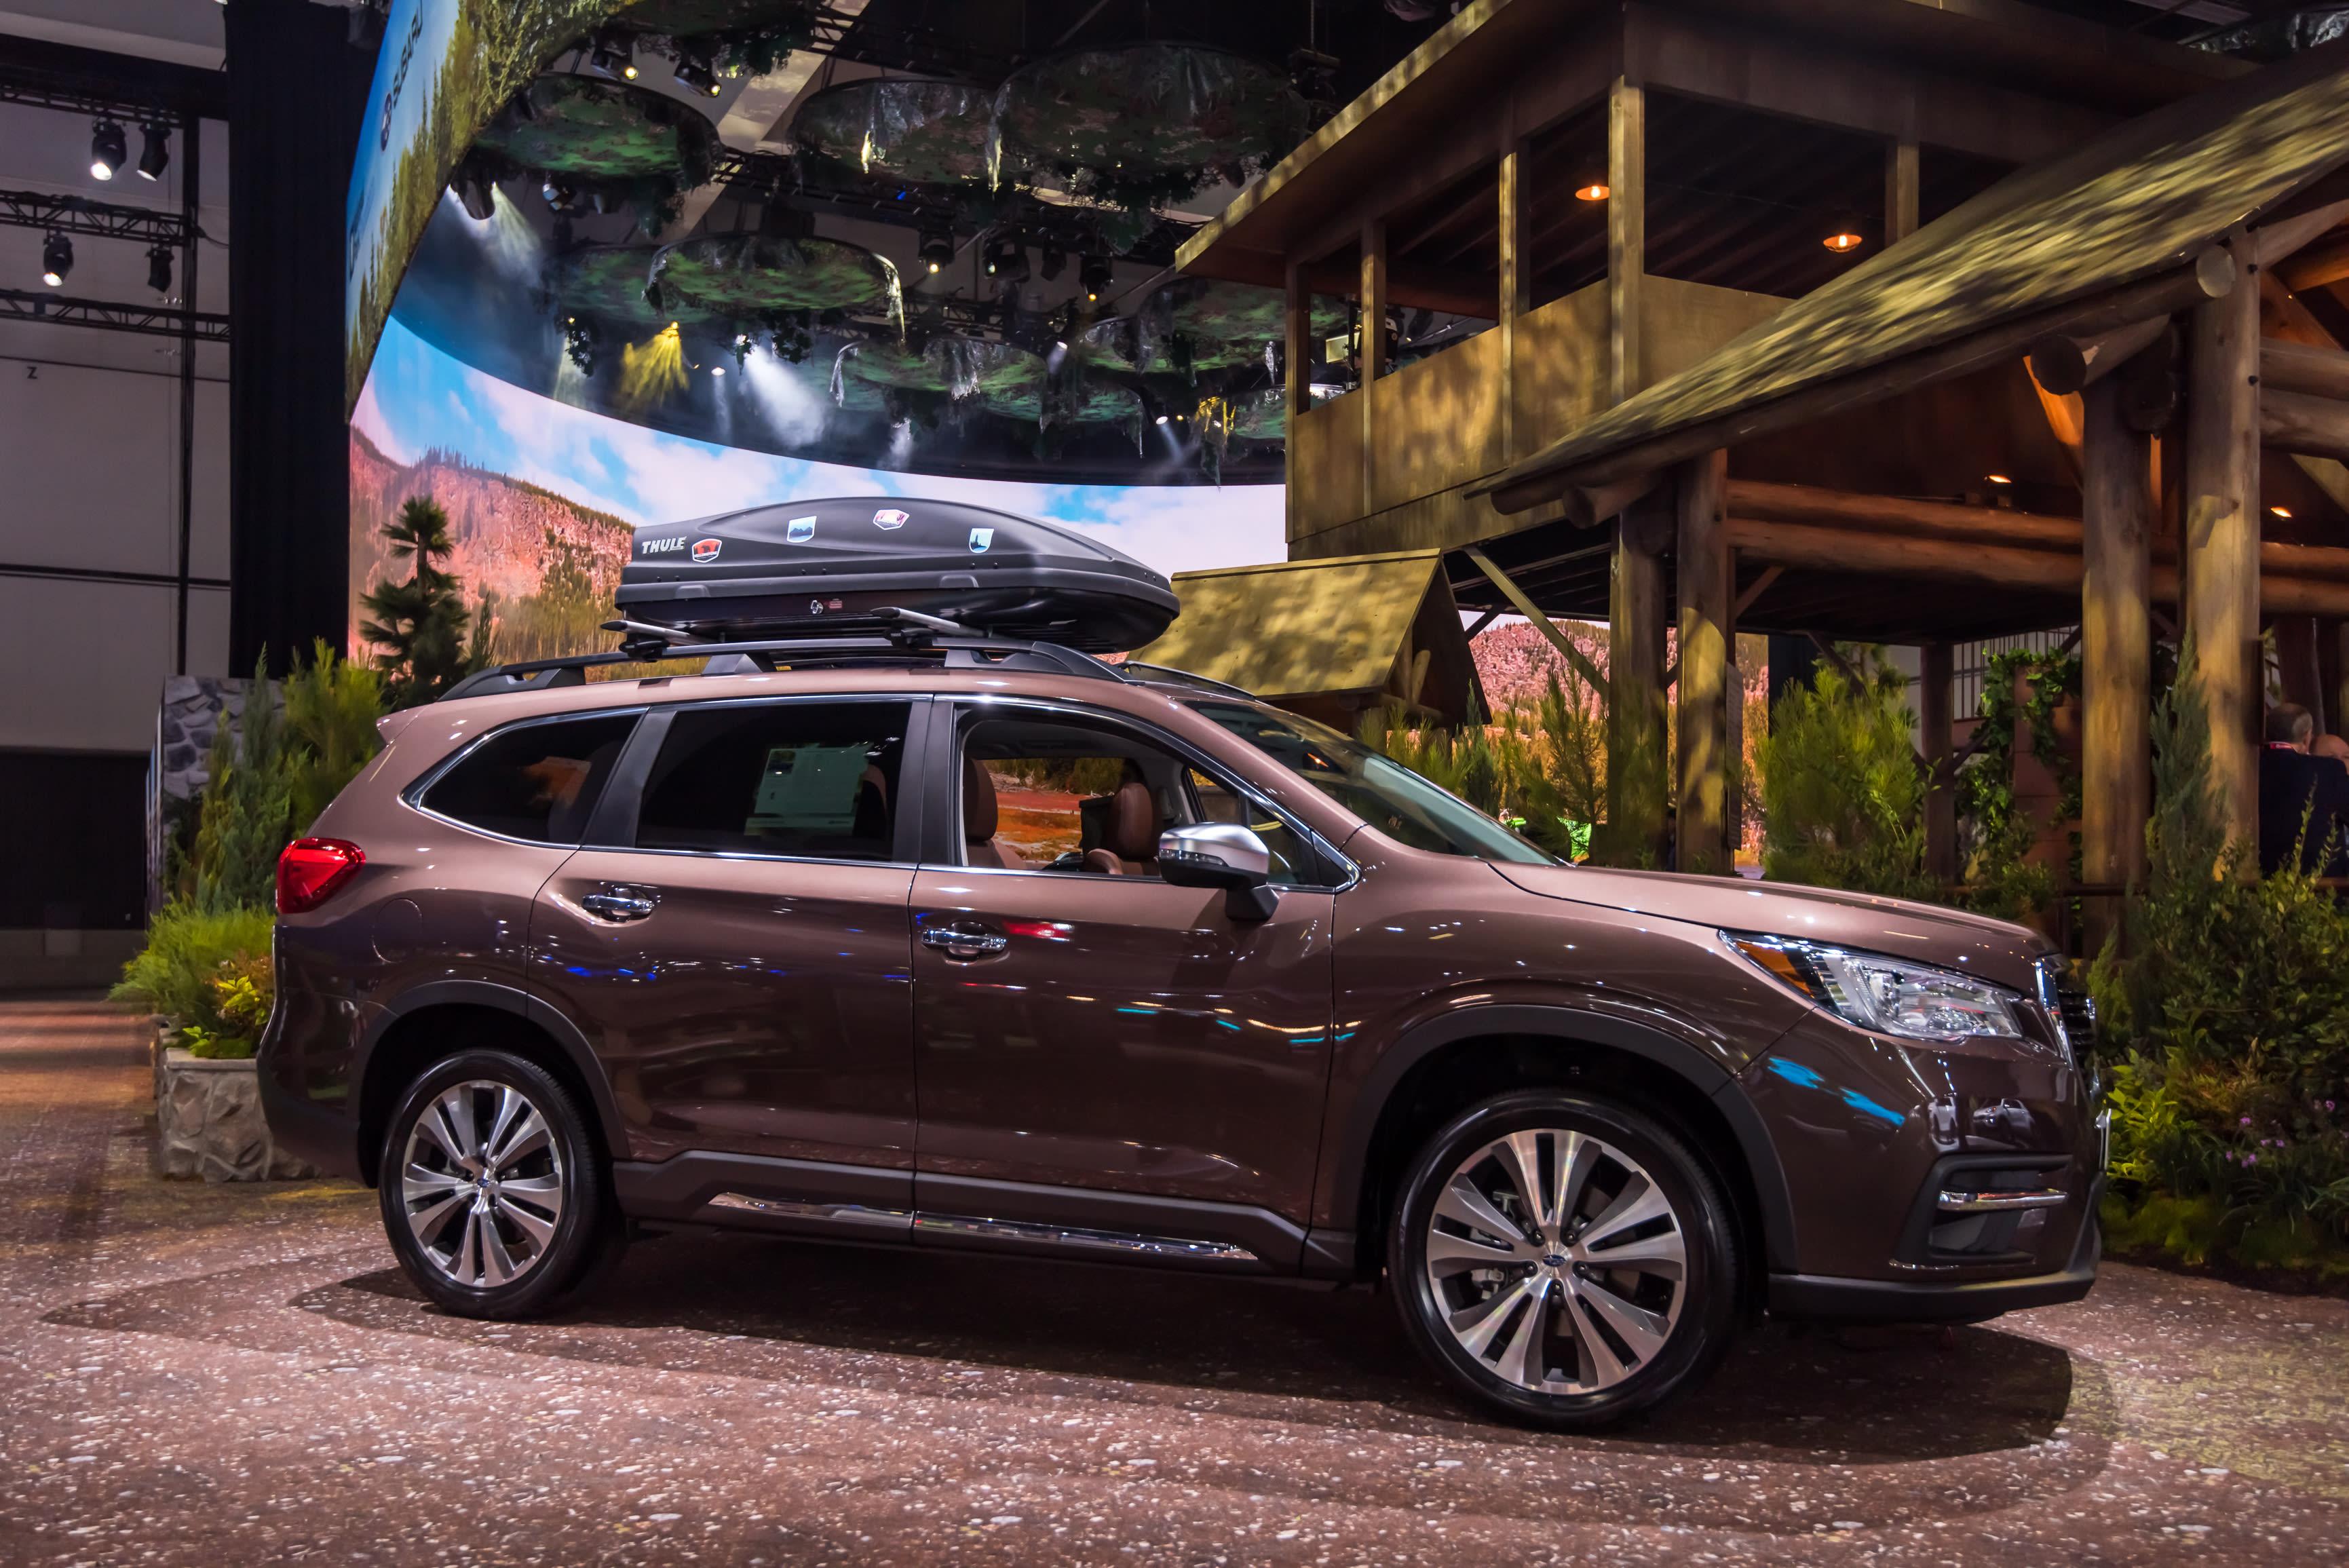 Subaru recalls SUVs with defective driveshafts